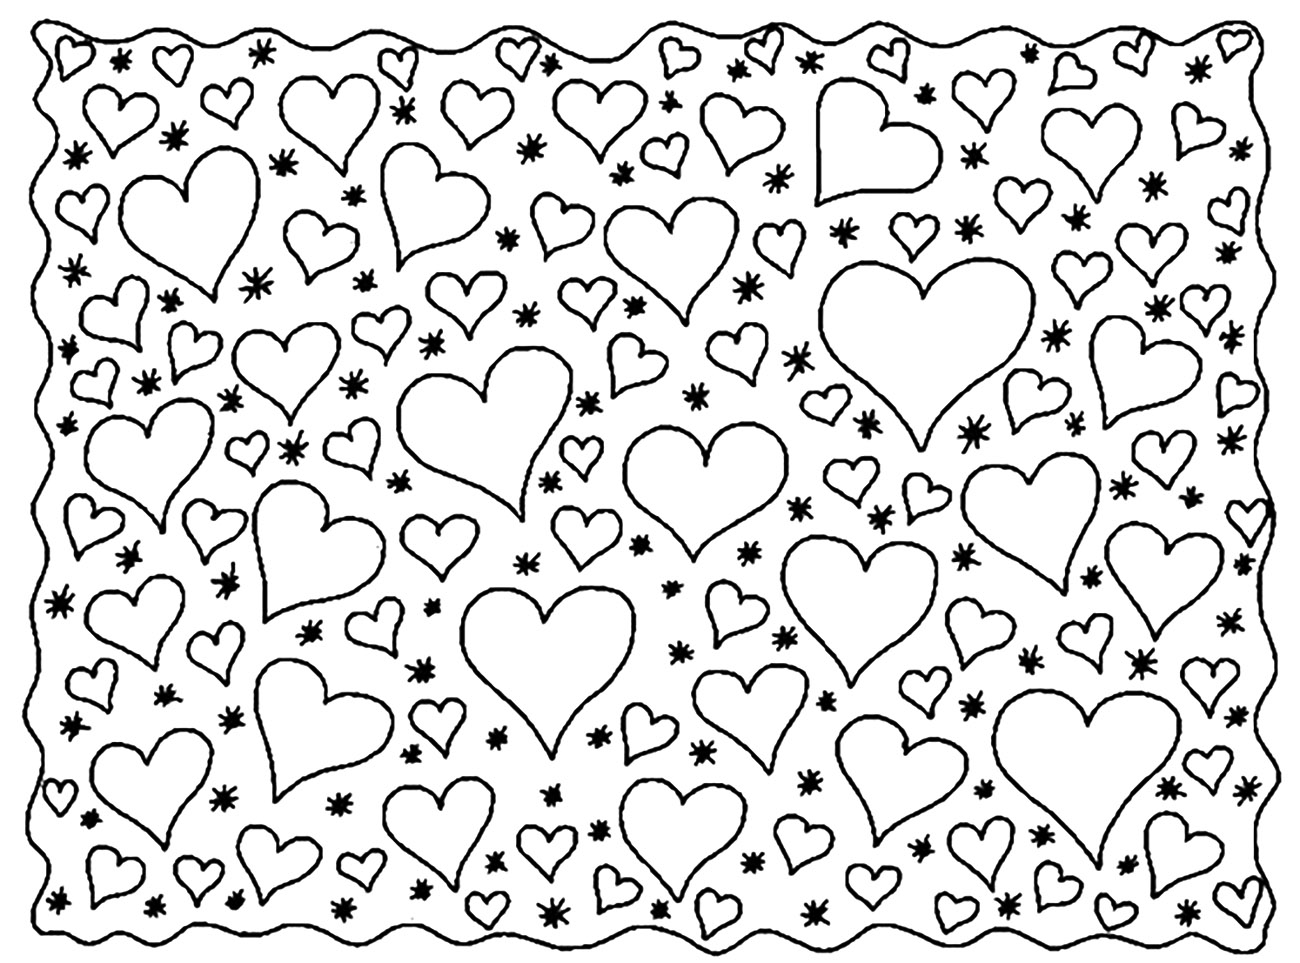 Coeur Amour 1 Anti Stress Art Therapie Coloriages Difficiles